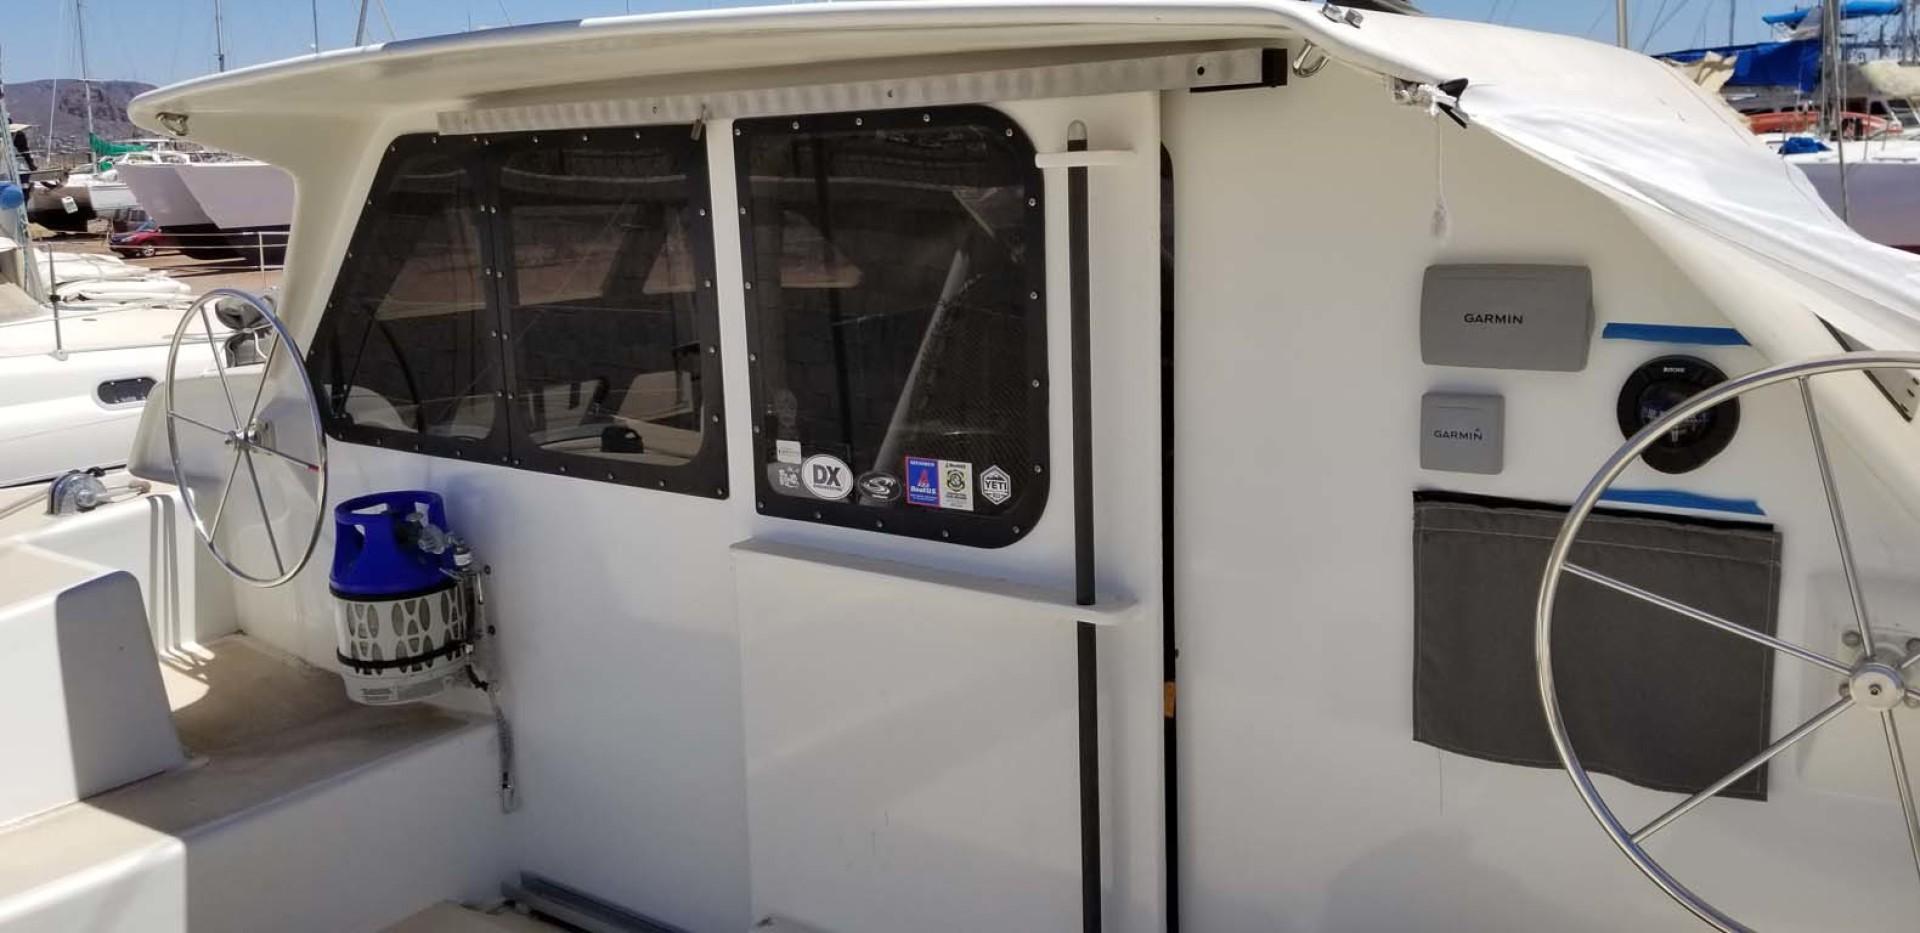 Farrier-44 SC 2014-Mariana Guaymas, SONORA-Mexico-Cockpit Bulkhead-1159492 | Thumbnail